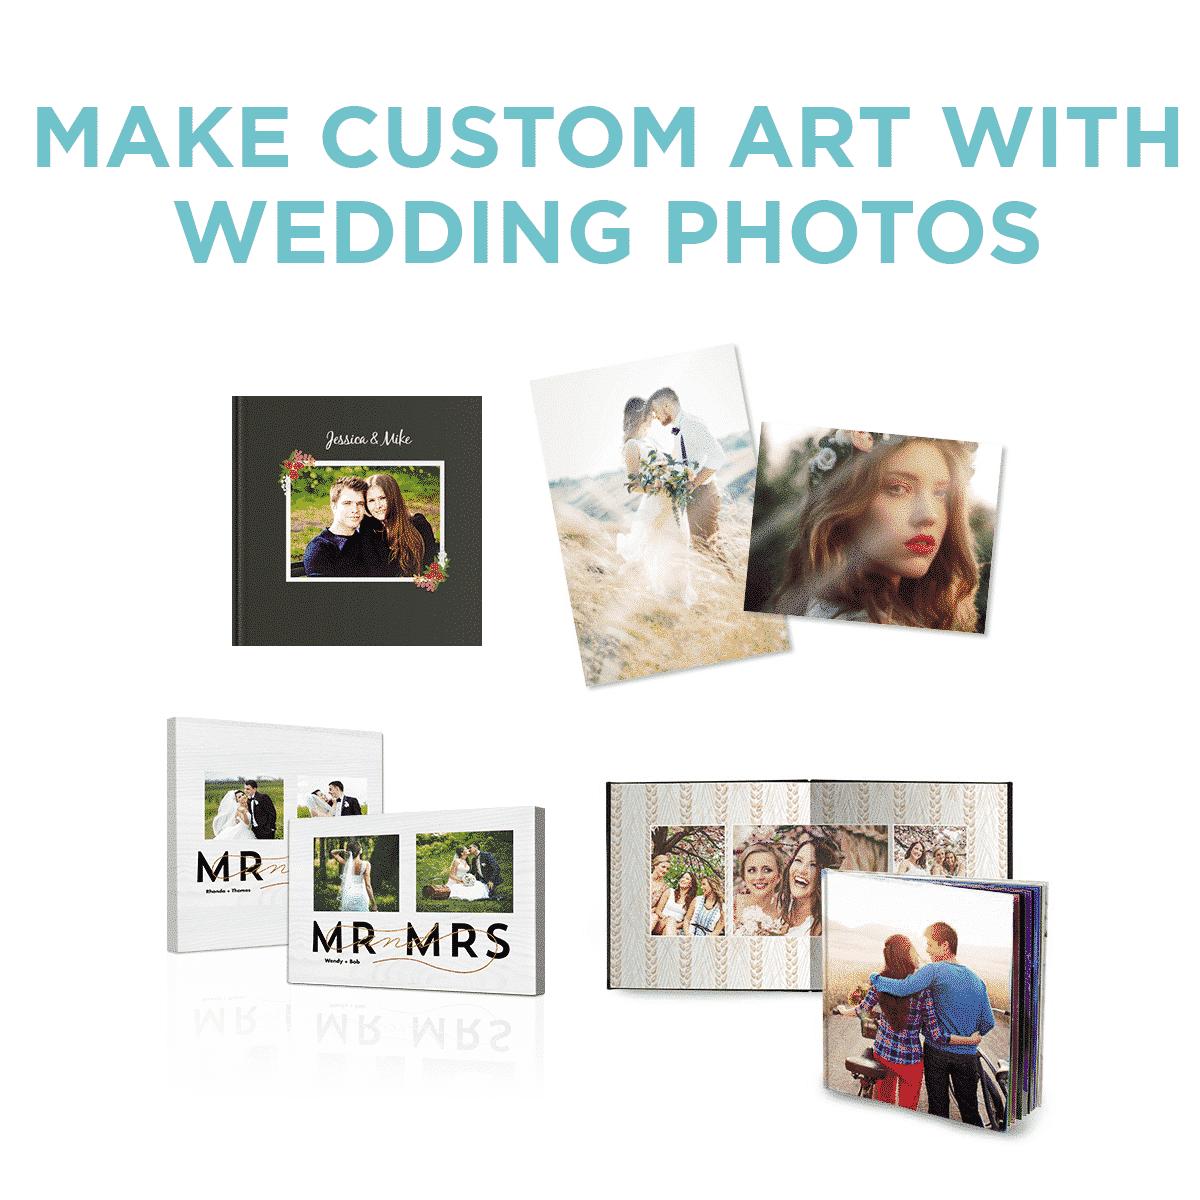 turn your wedding photos into custom art at Sam's Club